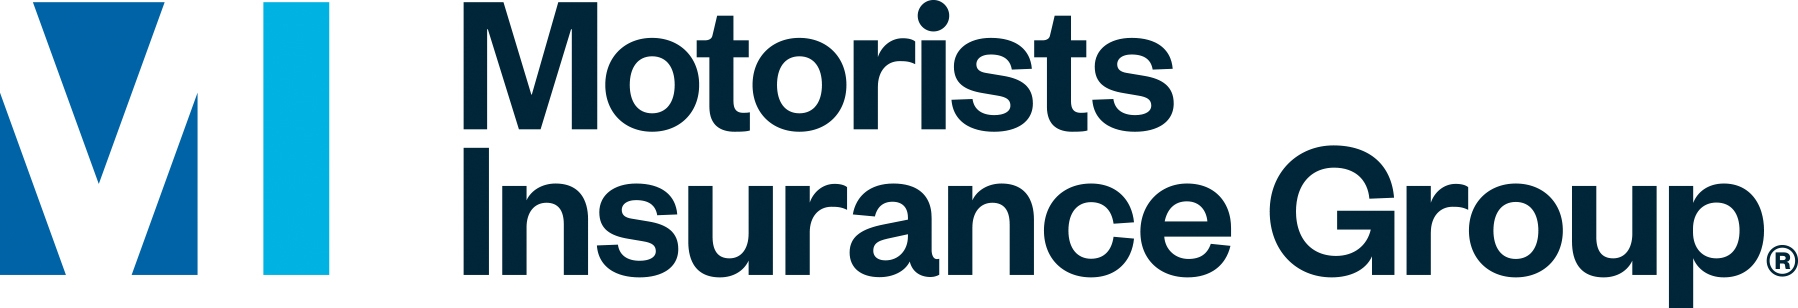 Motorists Insurance Group logo